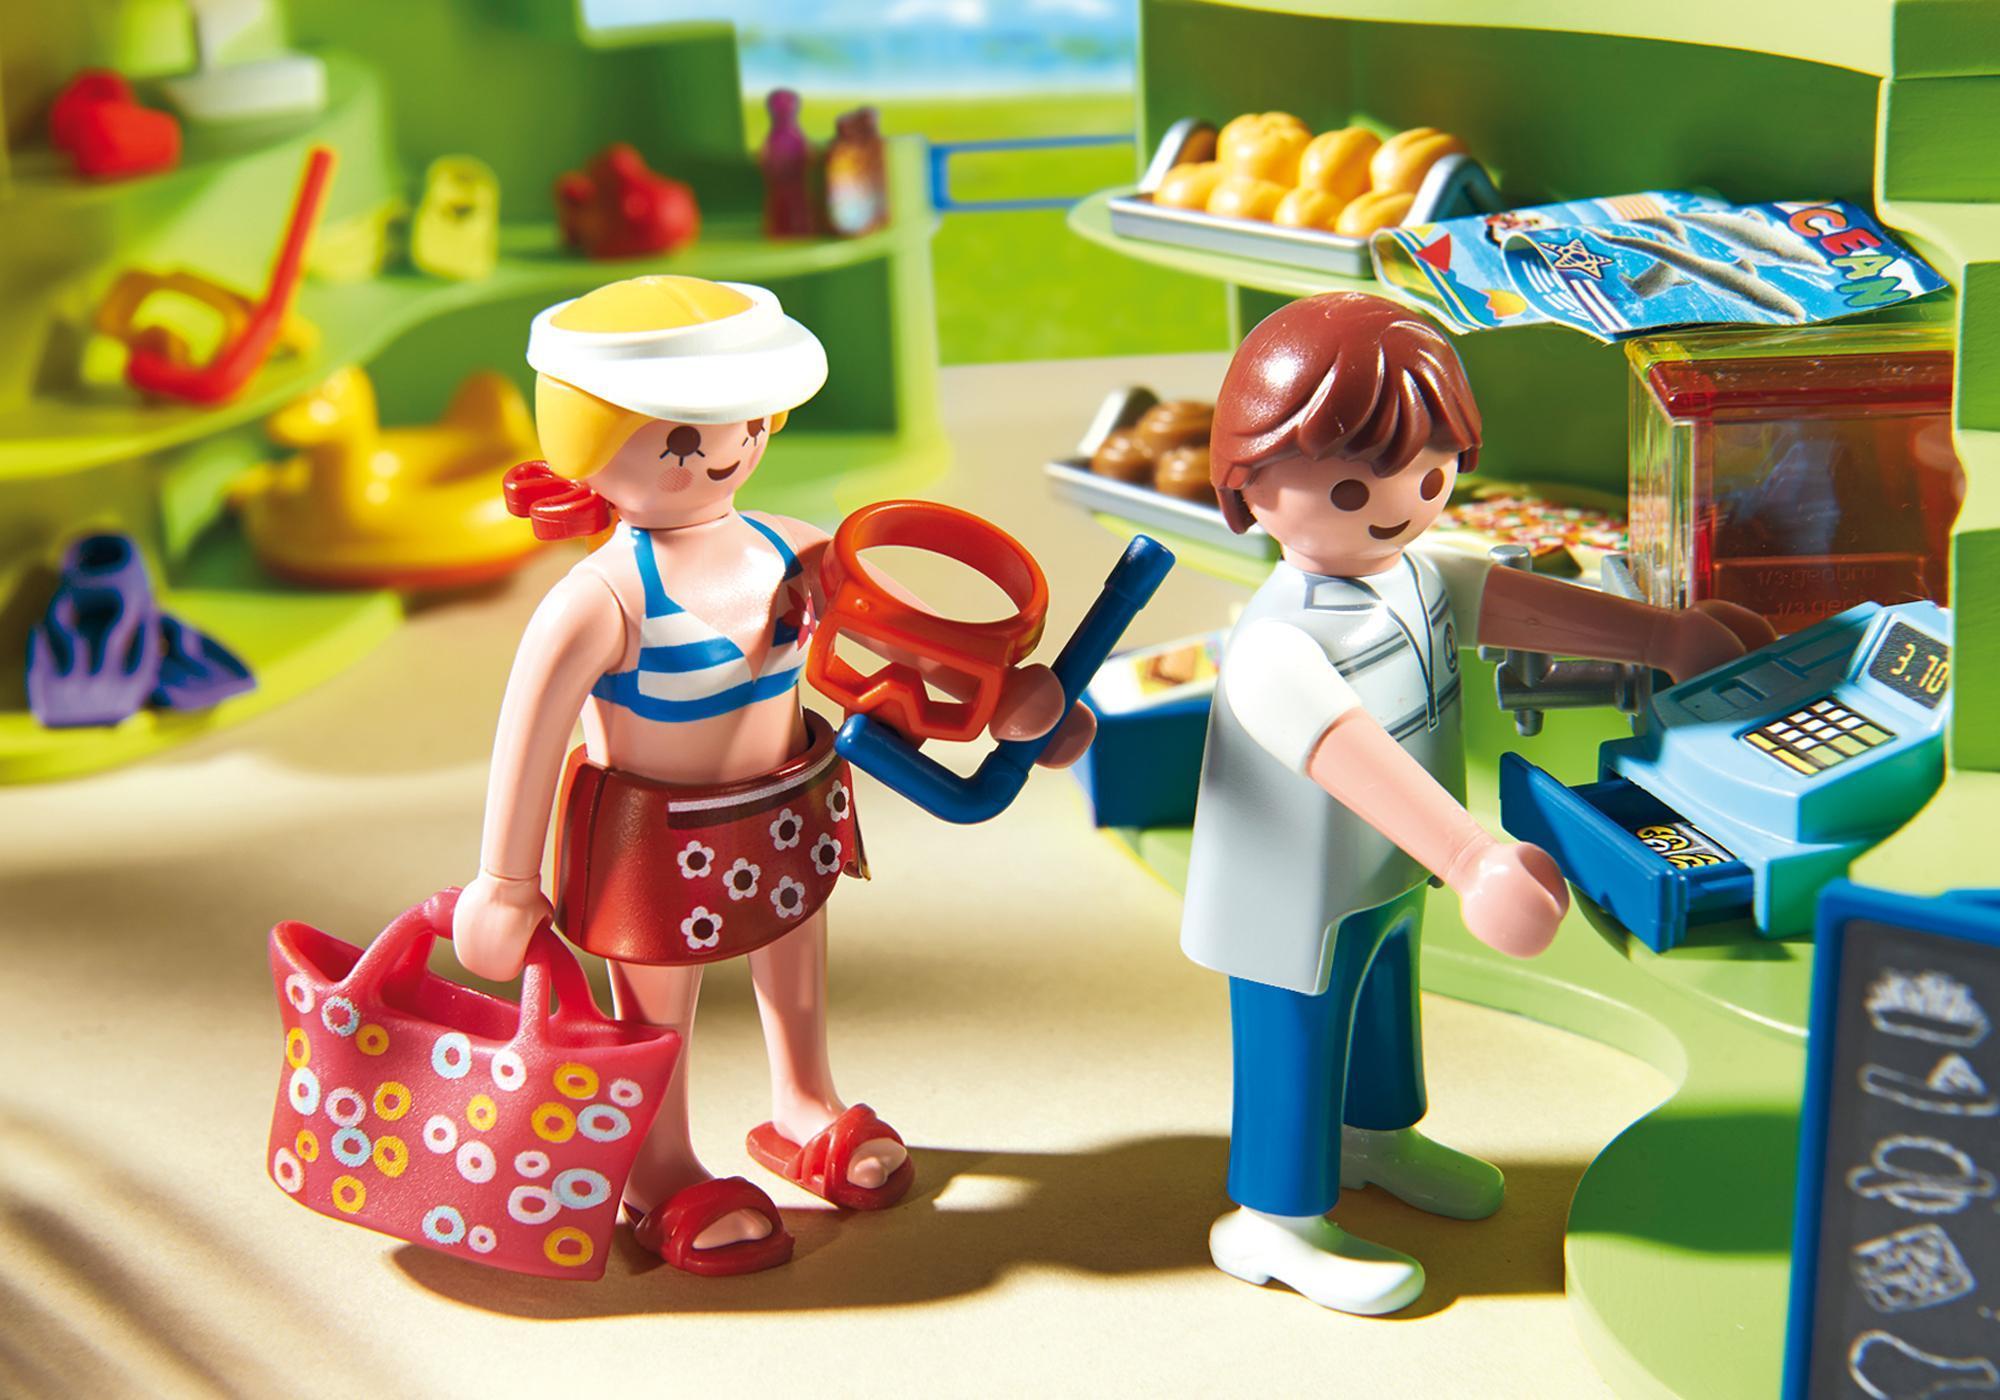 http://media.playmobil.com/i/playmobil/6672_product_extra1/Splish Splash Café